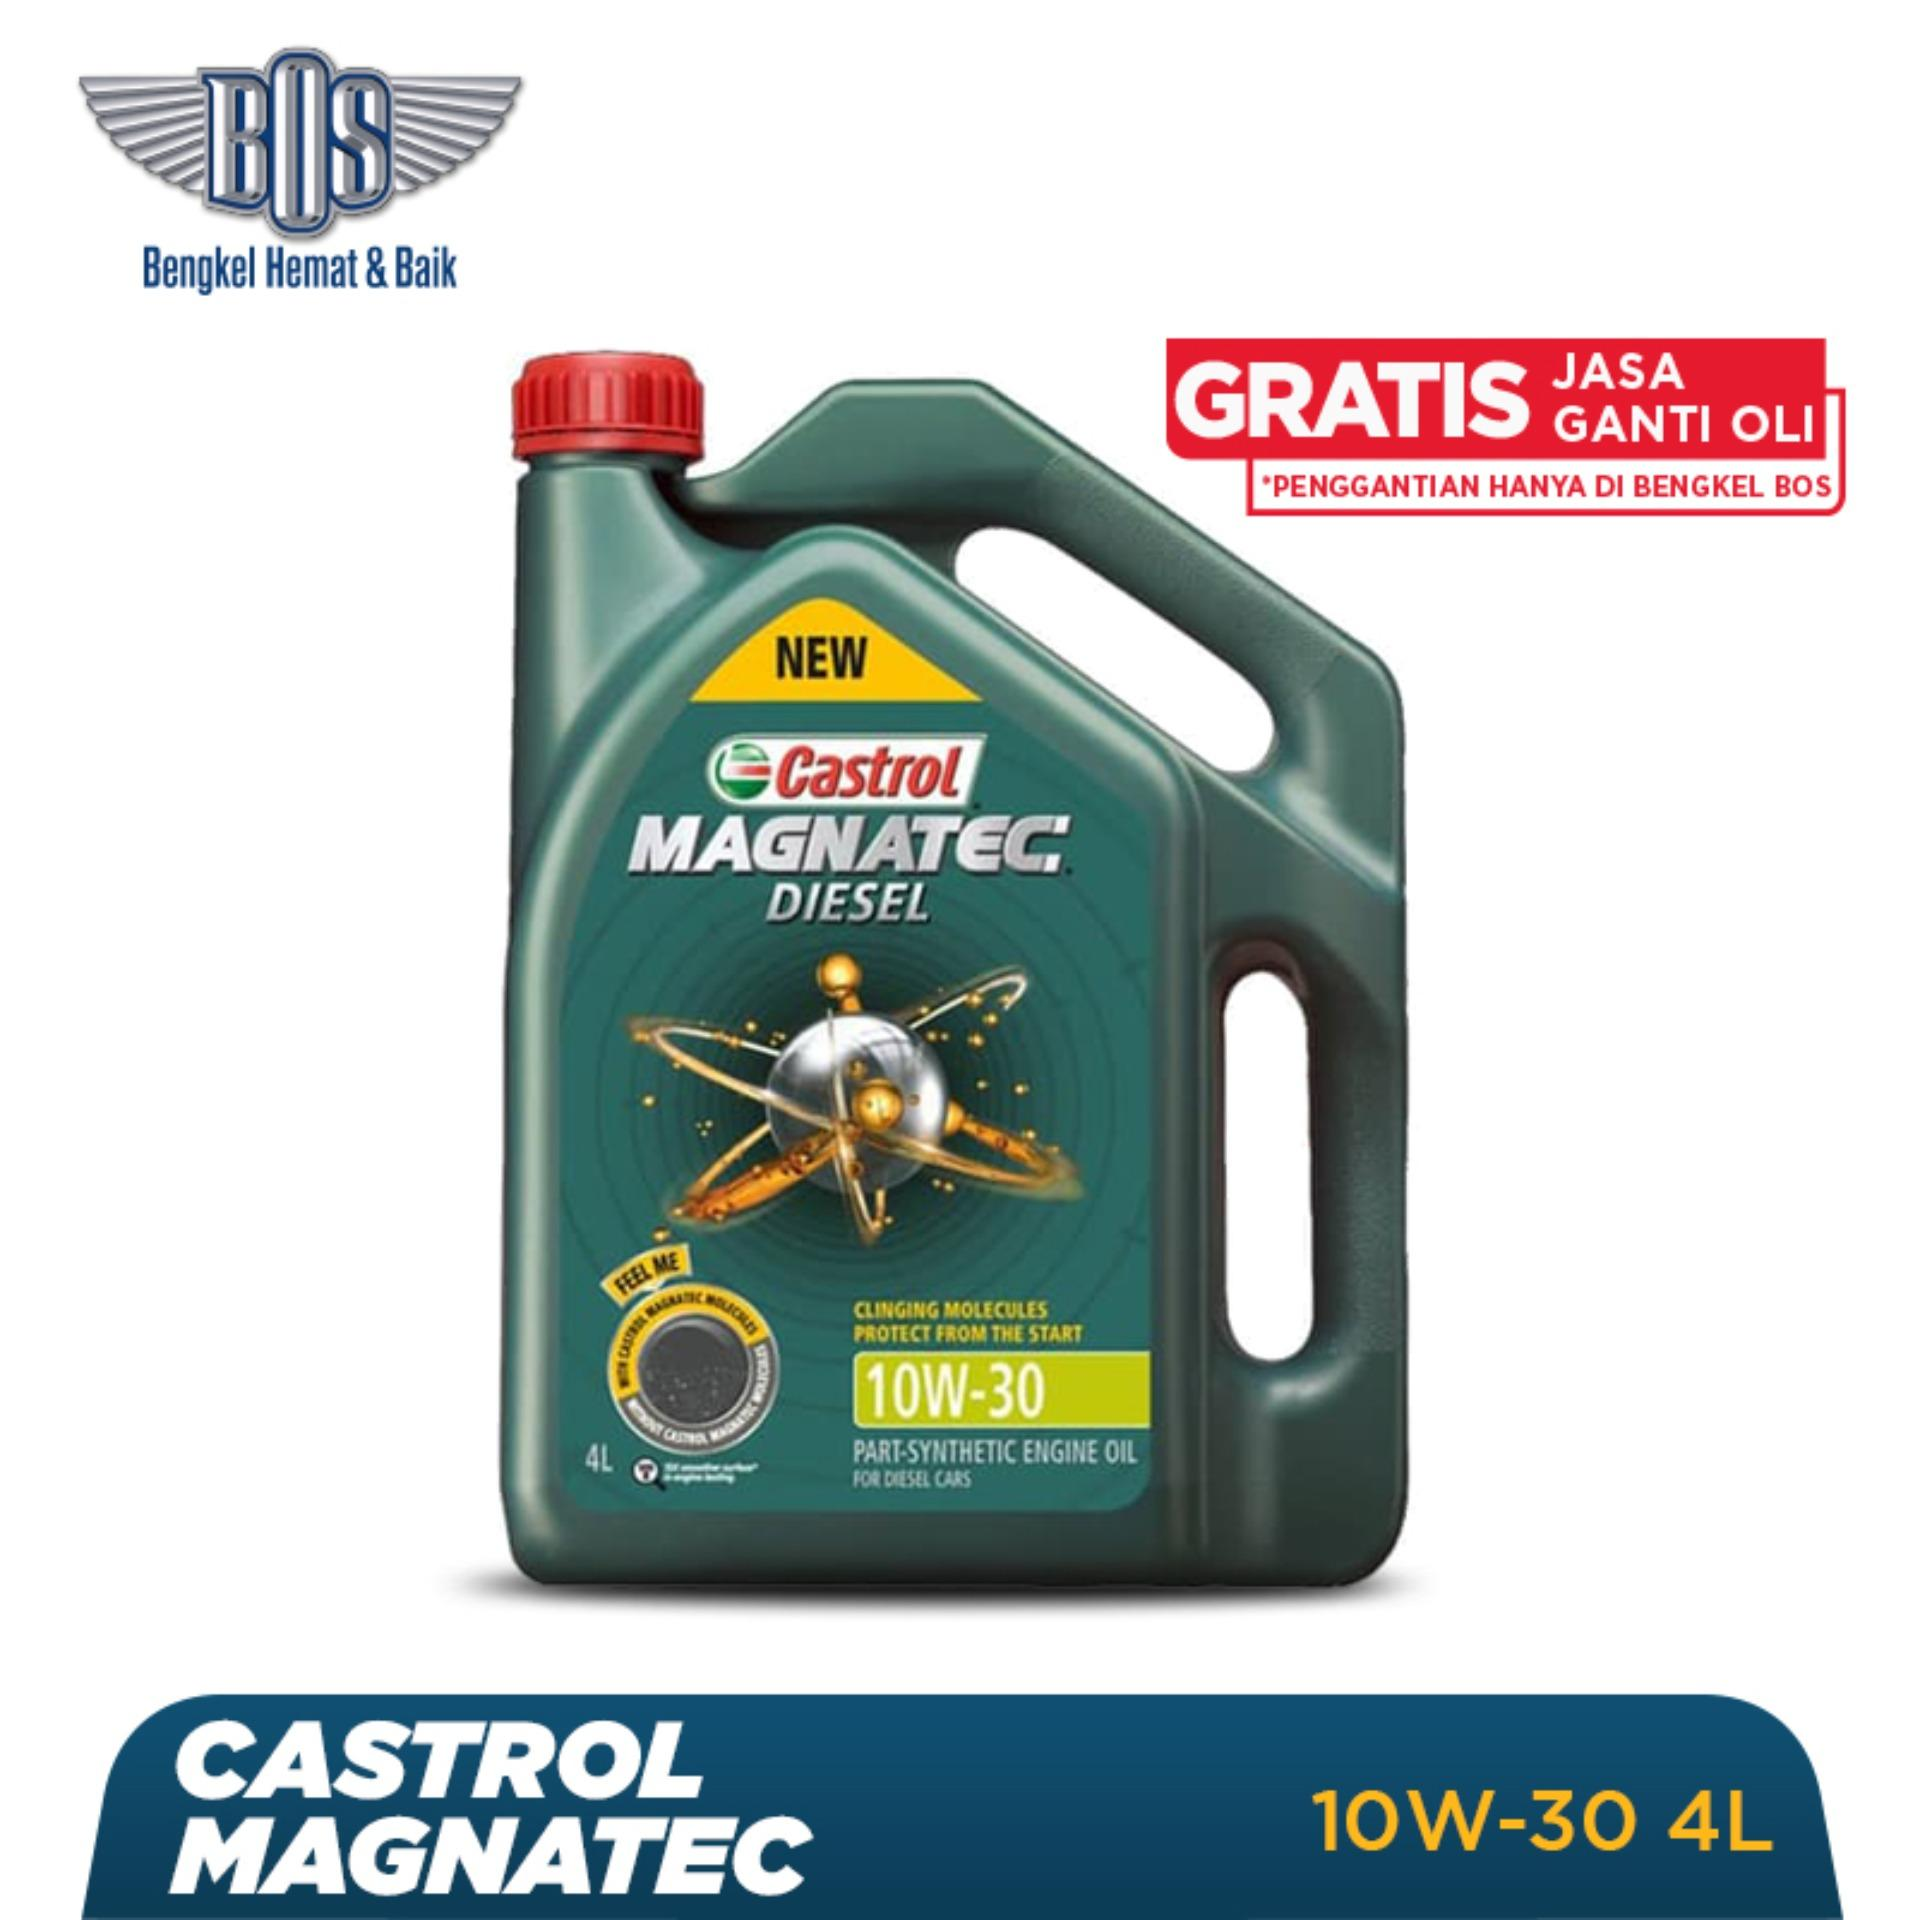 Oli Mobil Castrol Magnatec Diesel -  10W-30 - GALON -  Gratis Jasa Ganti Oli dan Check Up Kendaraan